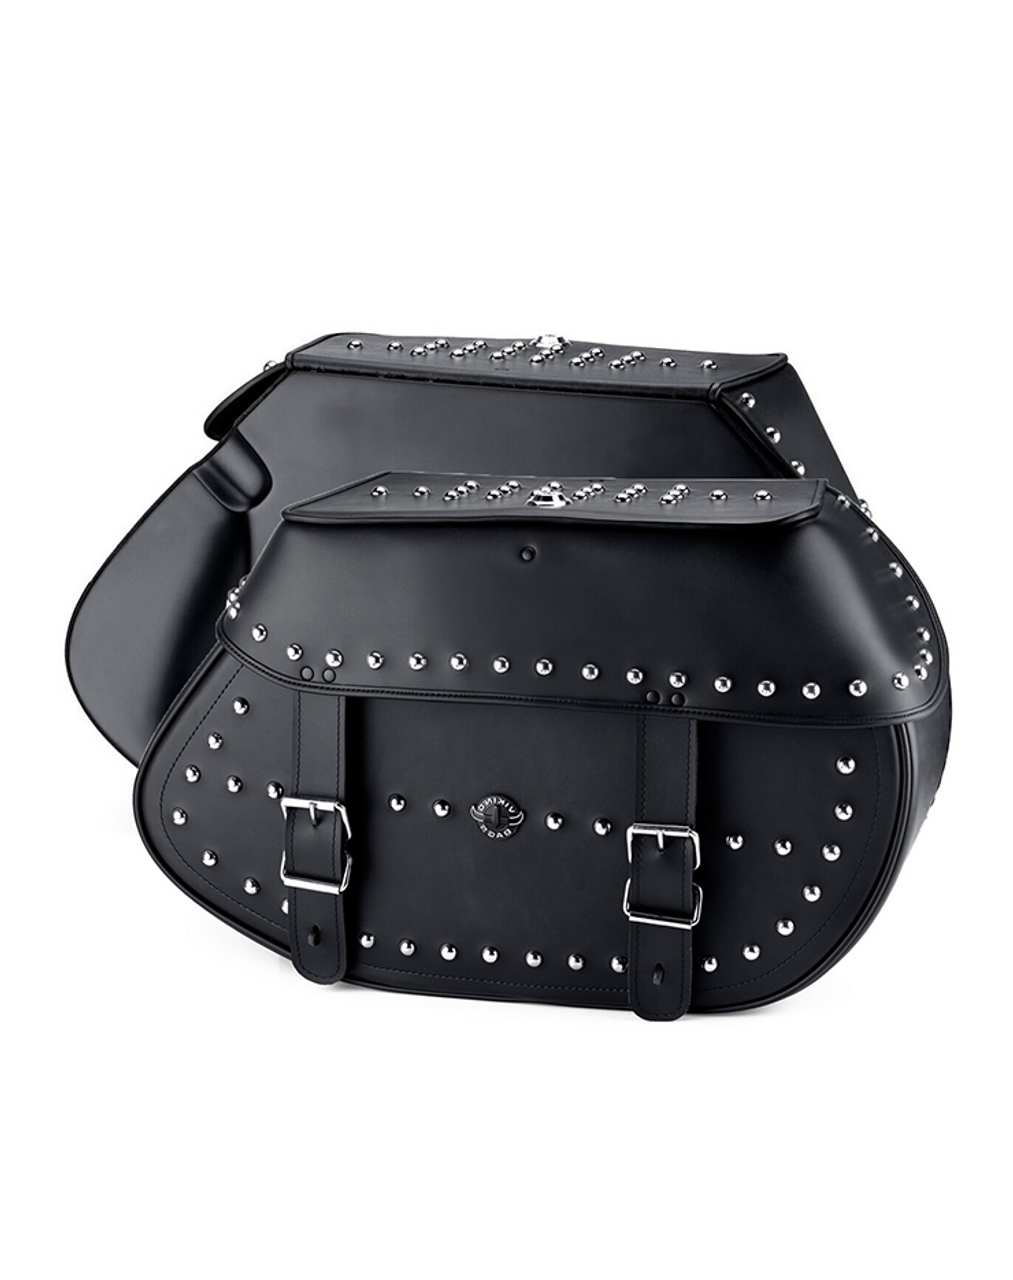 Viking Specific Studded Extra Large Saddlebags For Harley Softail Custom FXSTC Both Bag